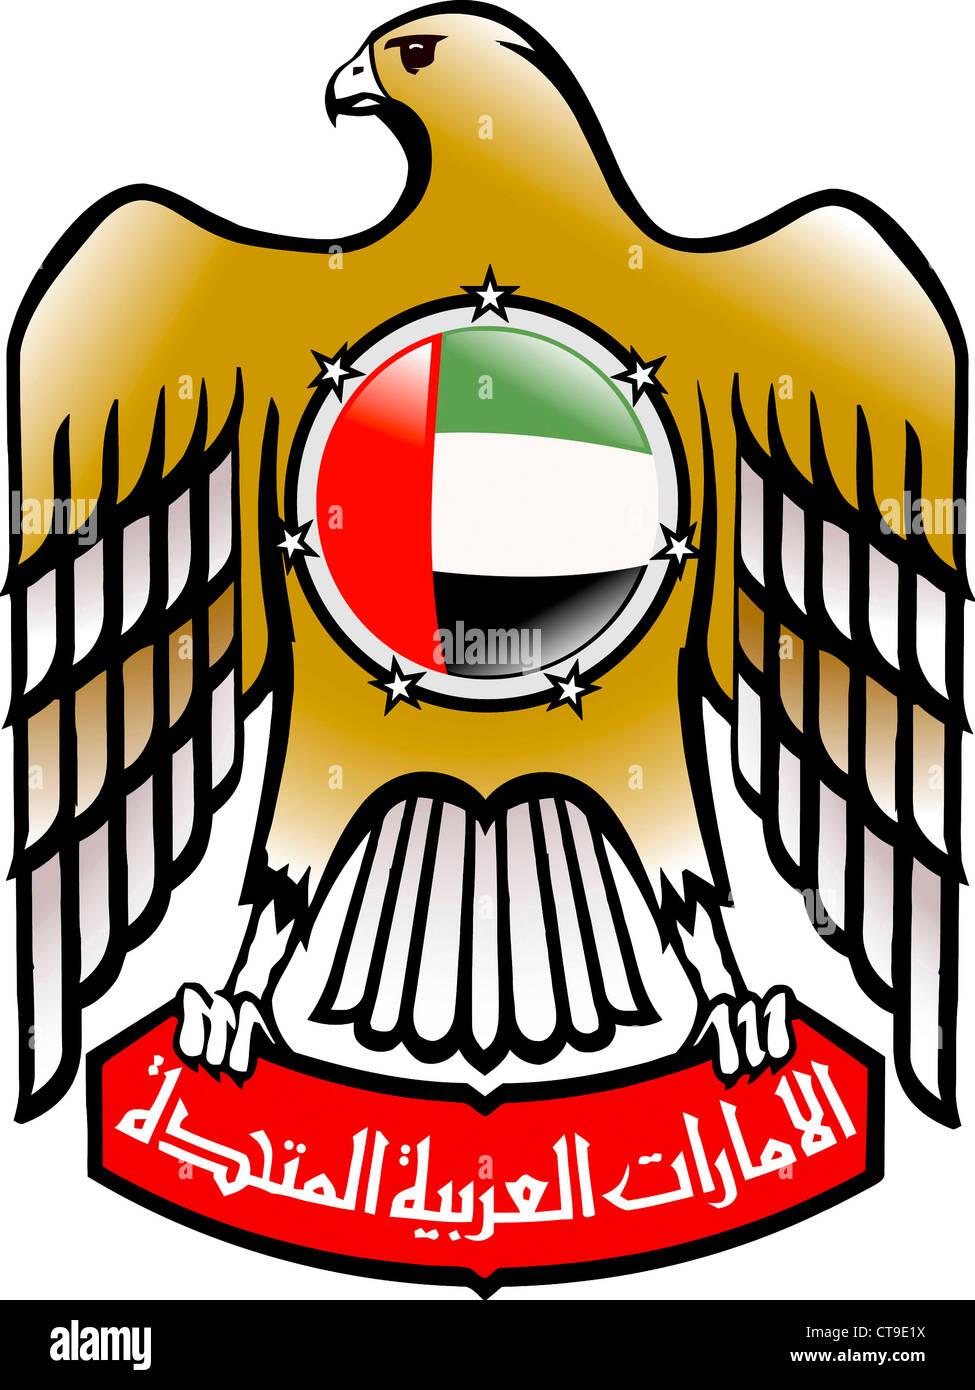 Coat Of Arms Of The United Arab Emirates Stock Photo 49381078 Alamy